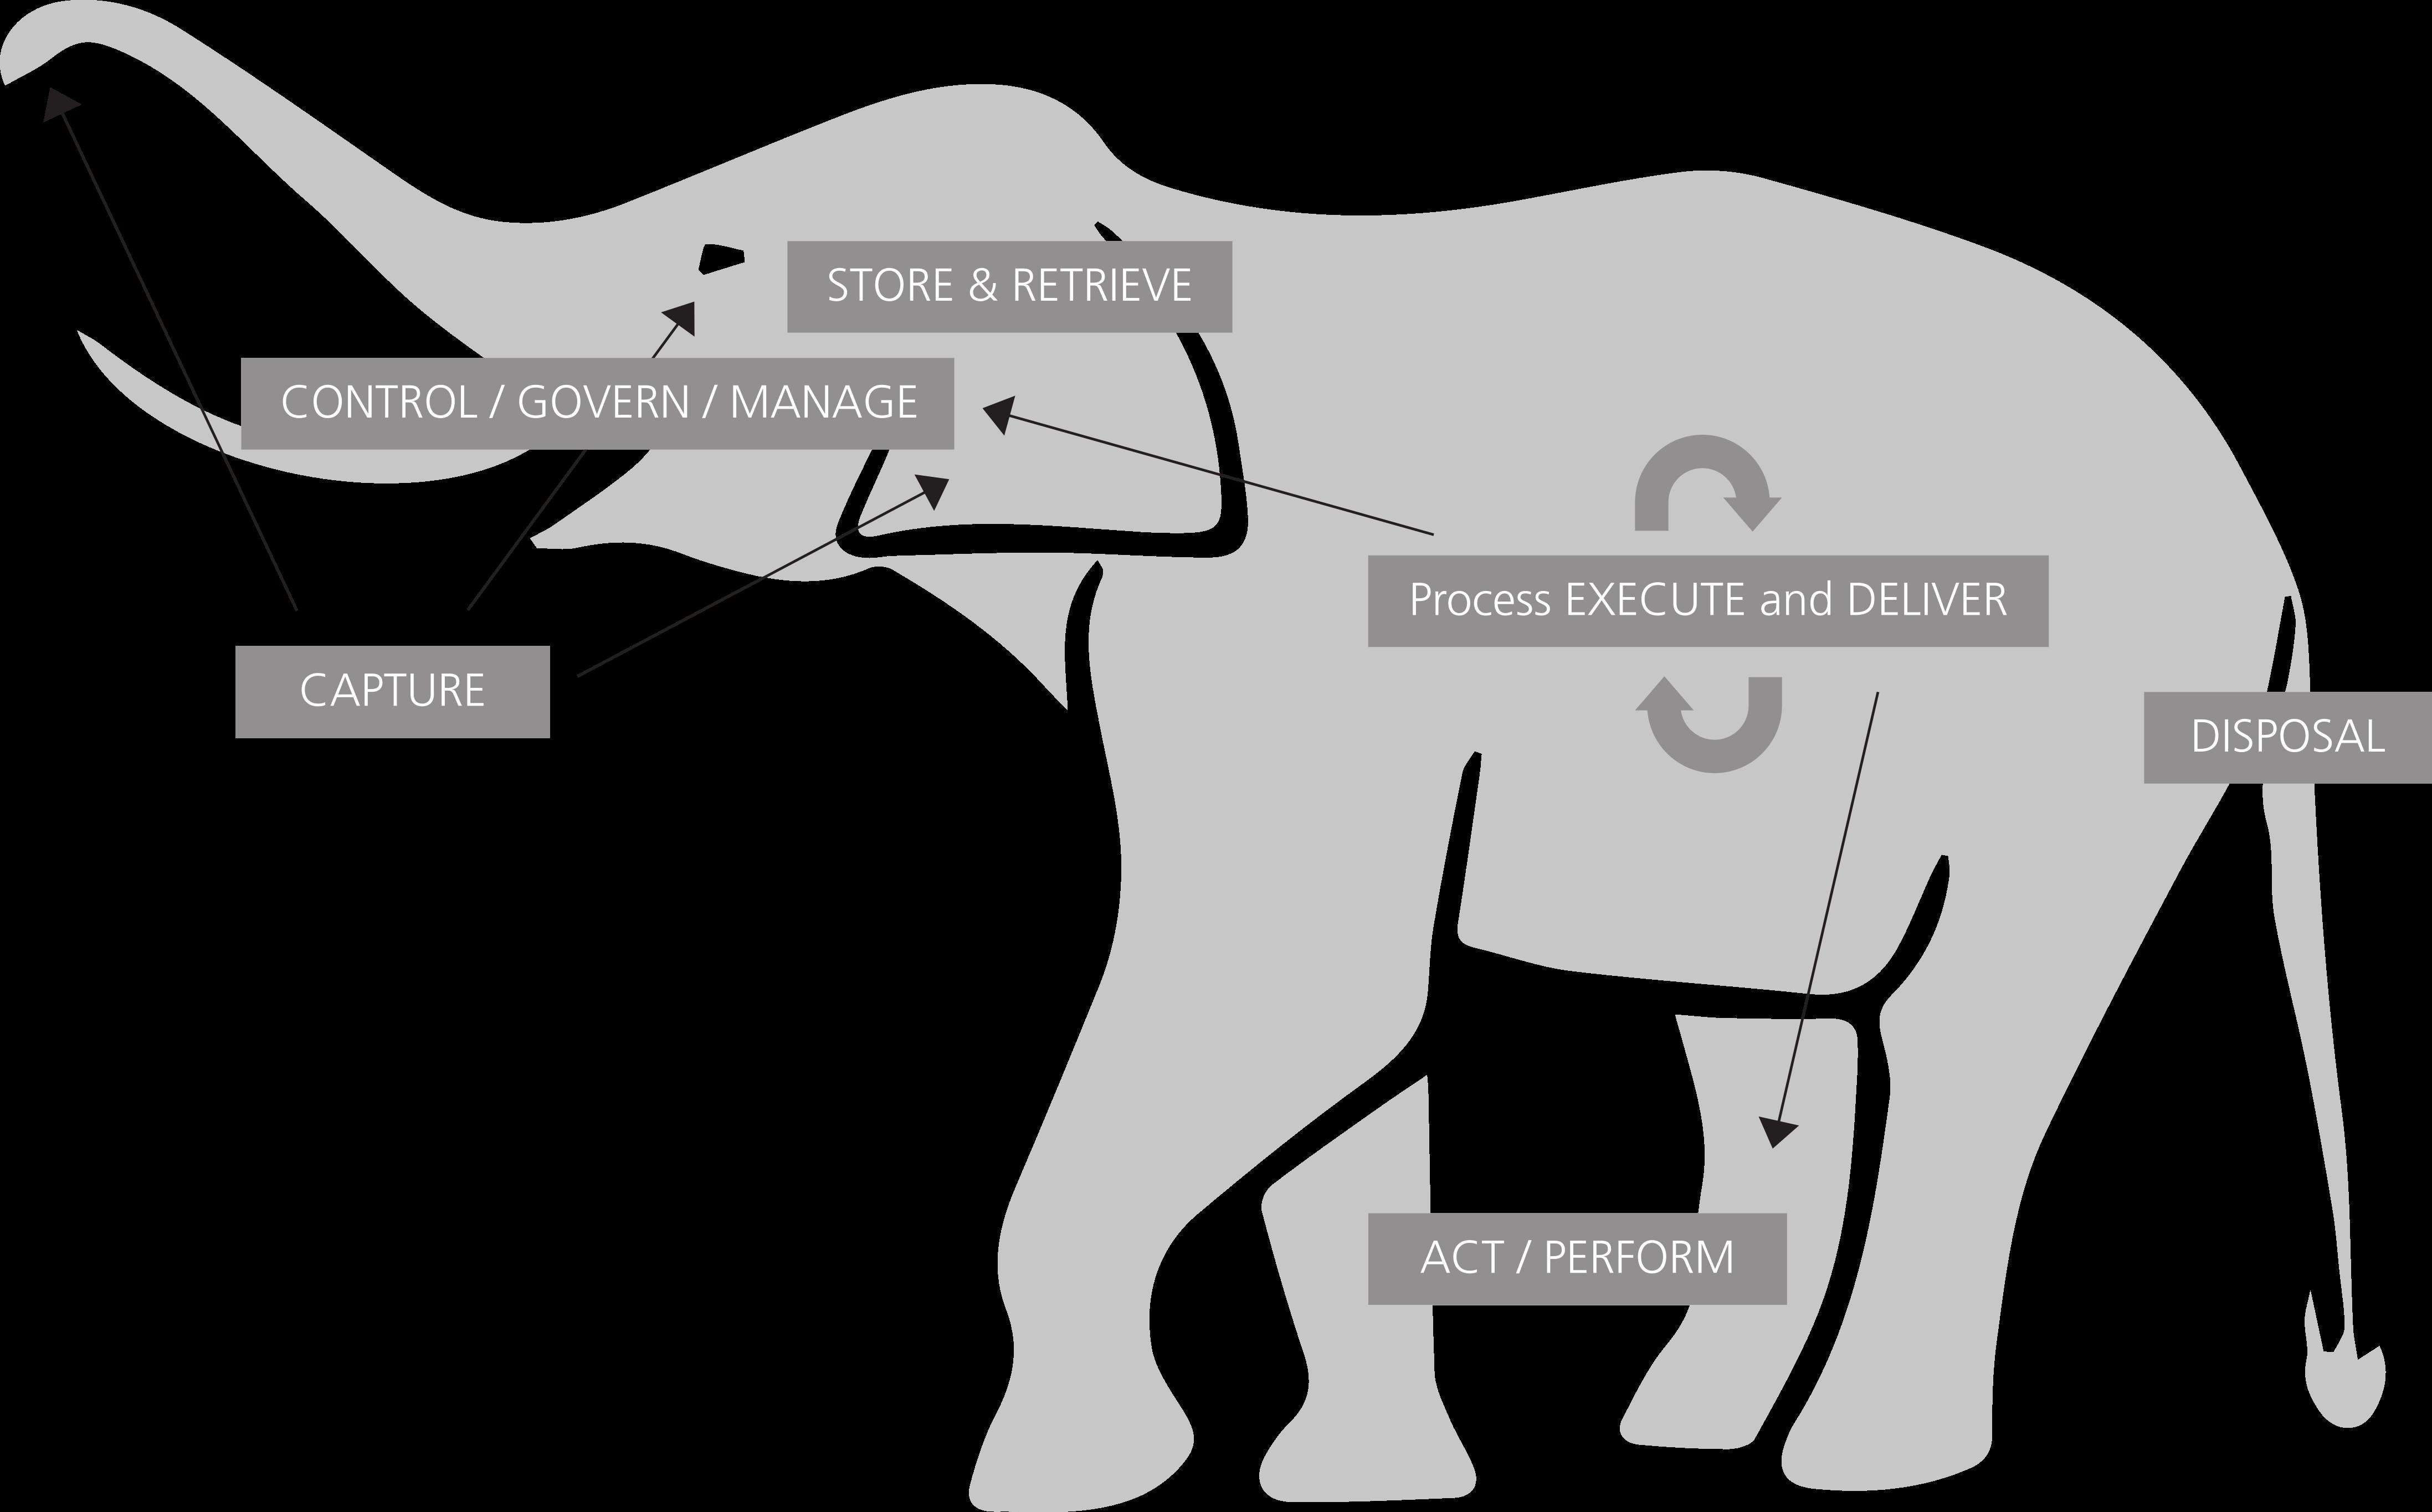 abb10_informationselefant